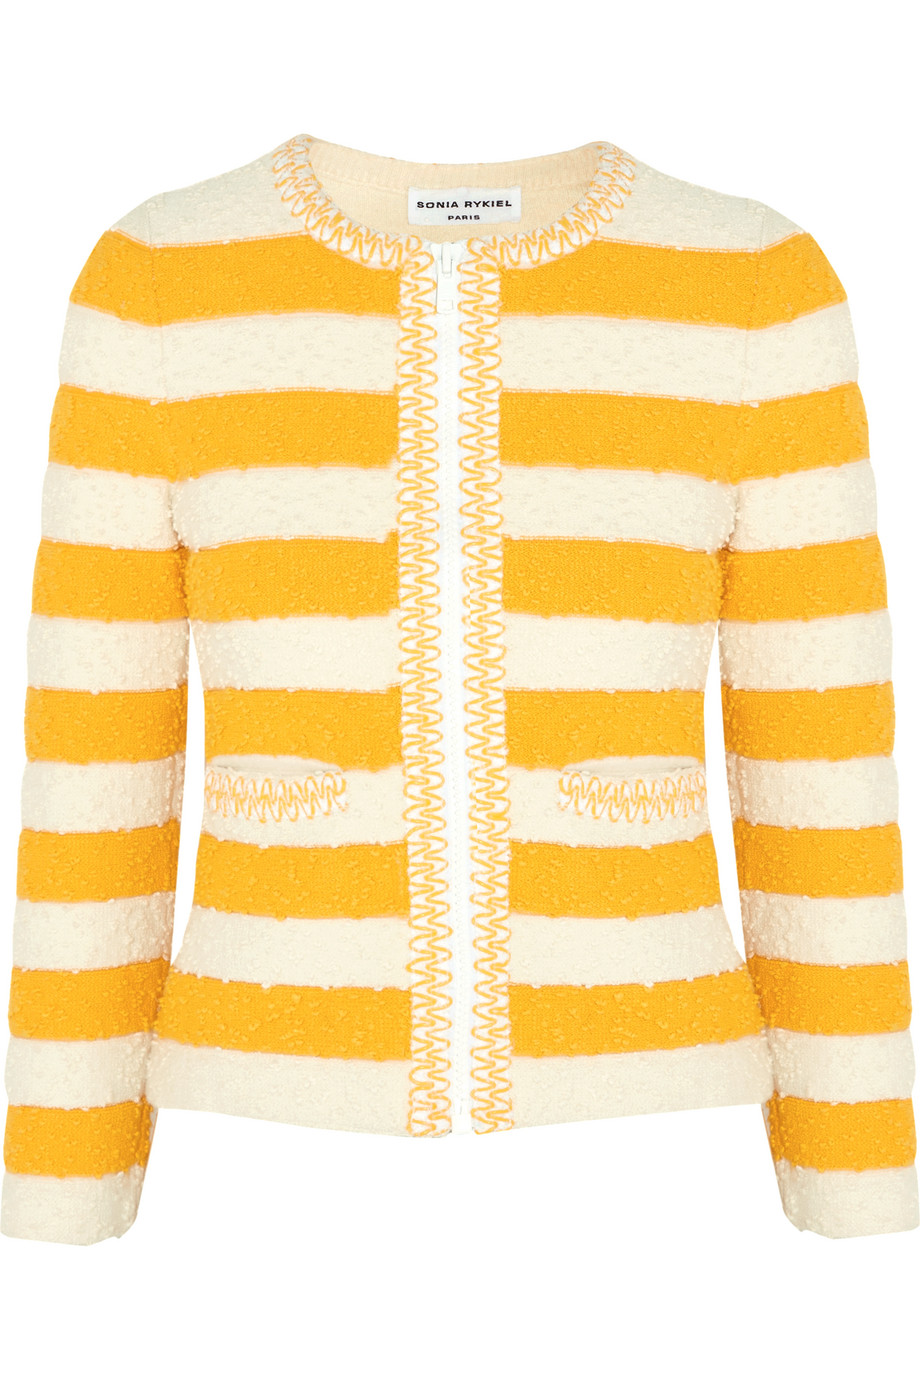 Sonia Rykiel Striped Bouclé-Knit Jacket, Marigold/White, Women's, Size: 38